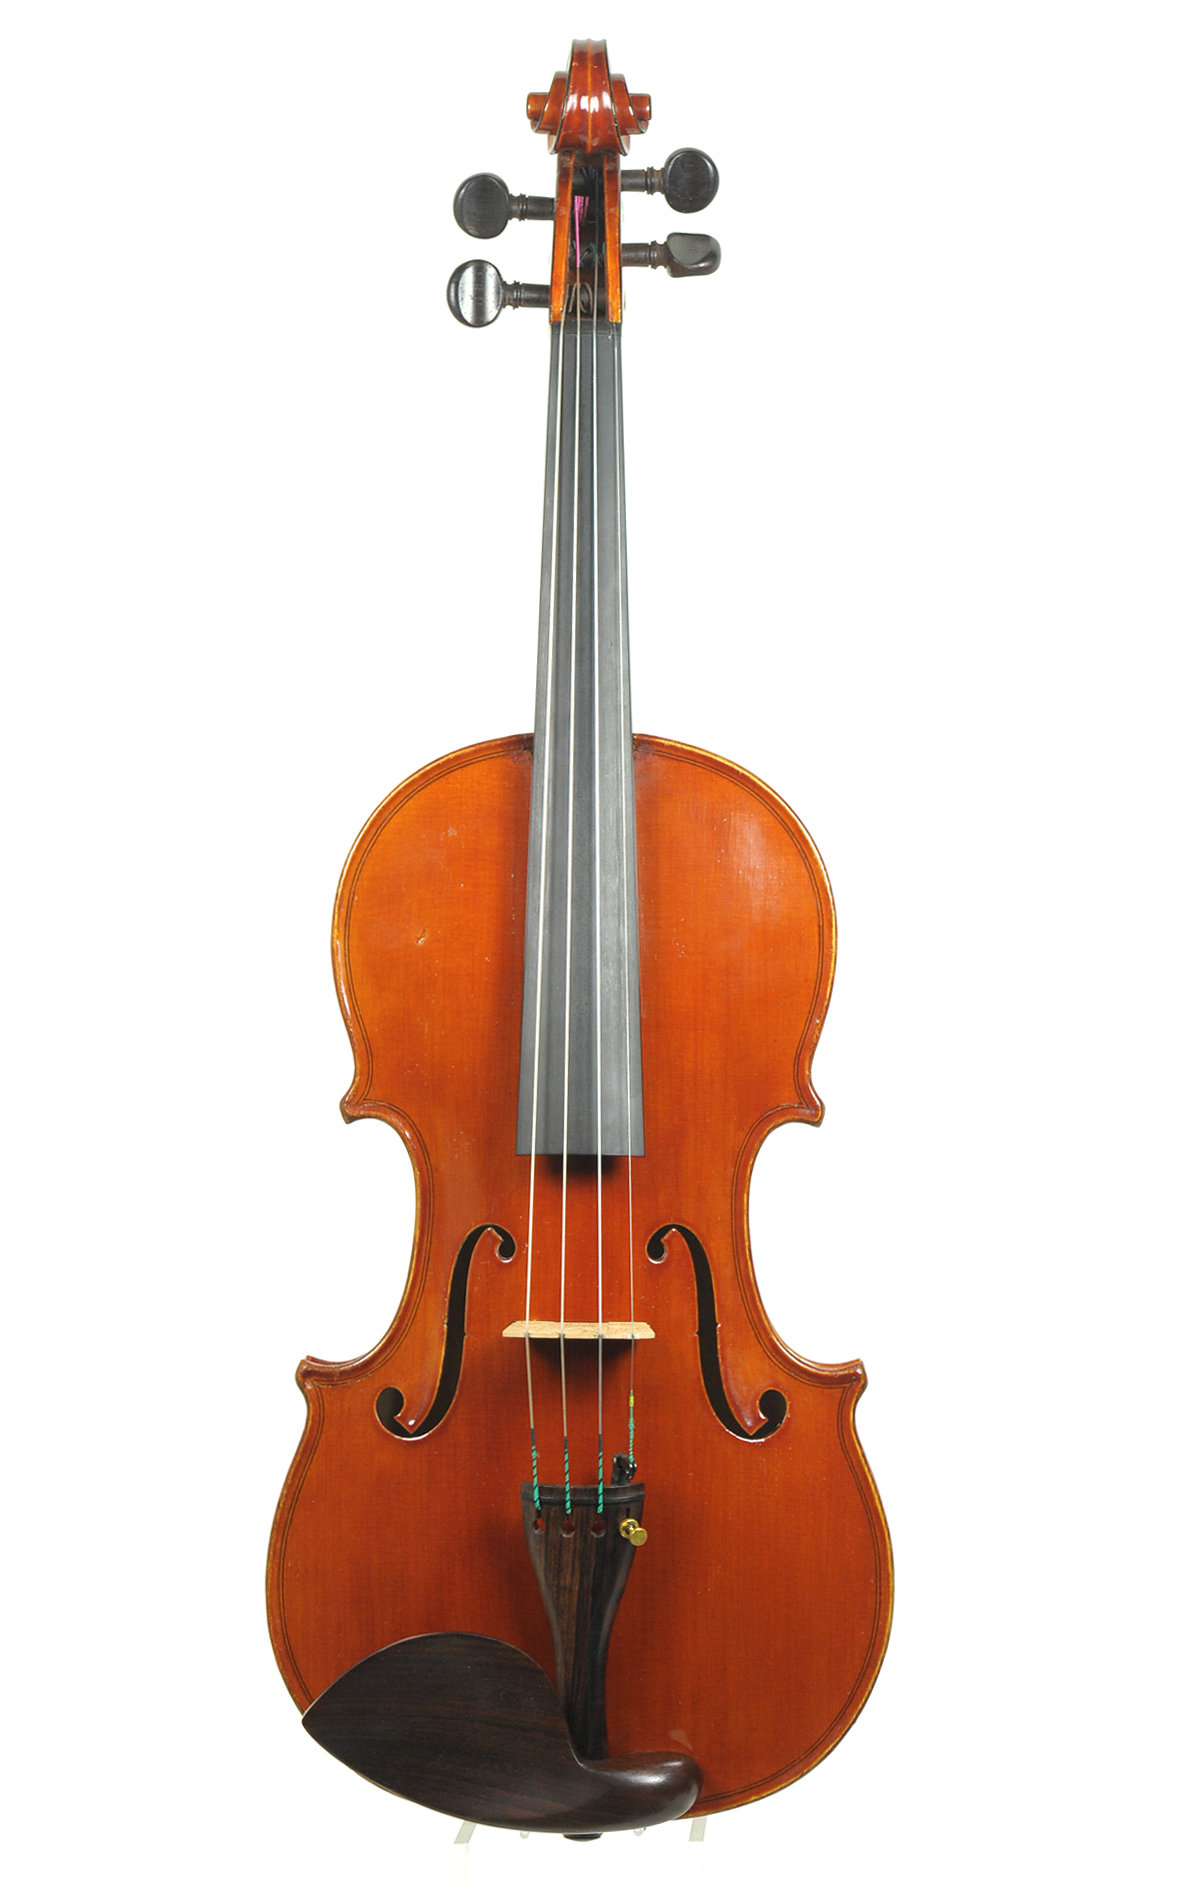 Geige von Plinio Michetti, Quelle: Corilom violins